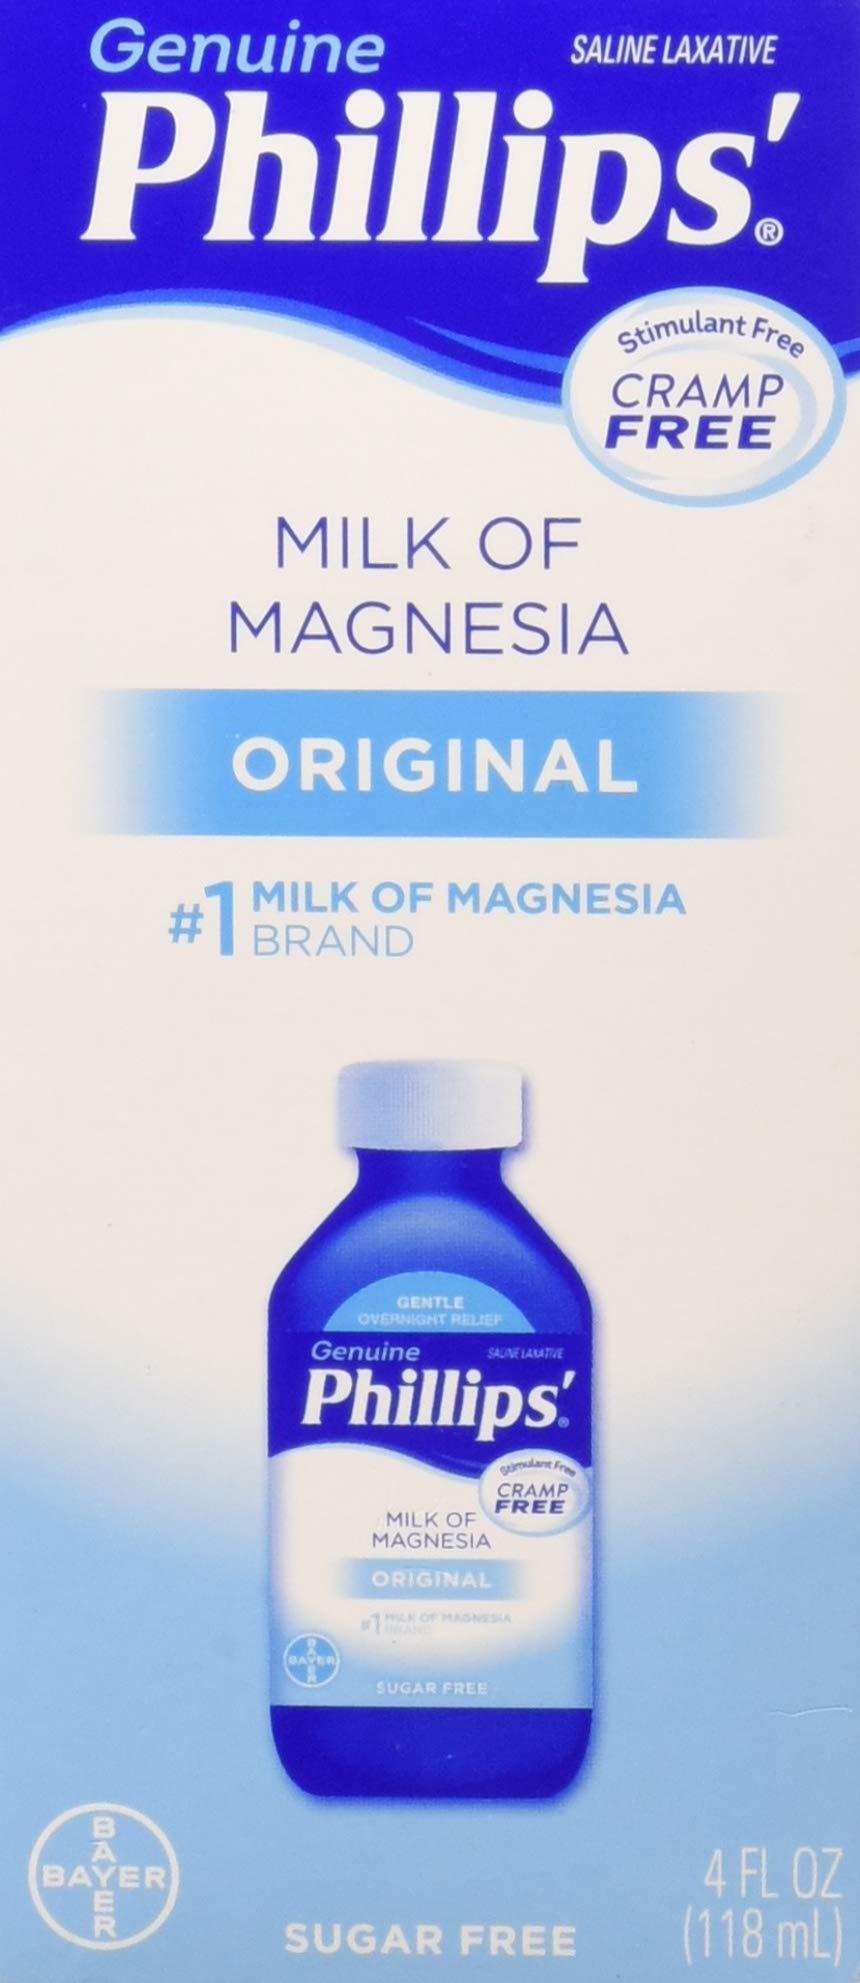 Philips' Milk of Magnesia Saline Laxative Original Sugar Free, 4 oz